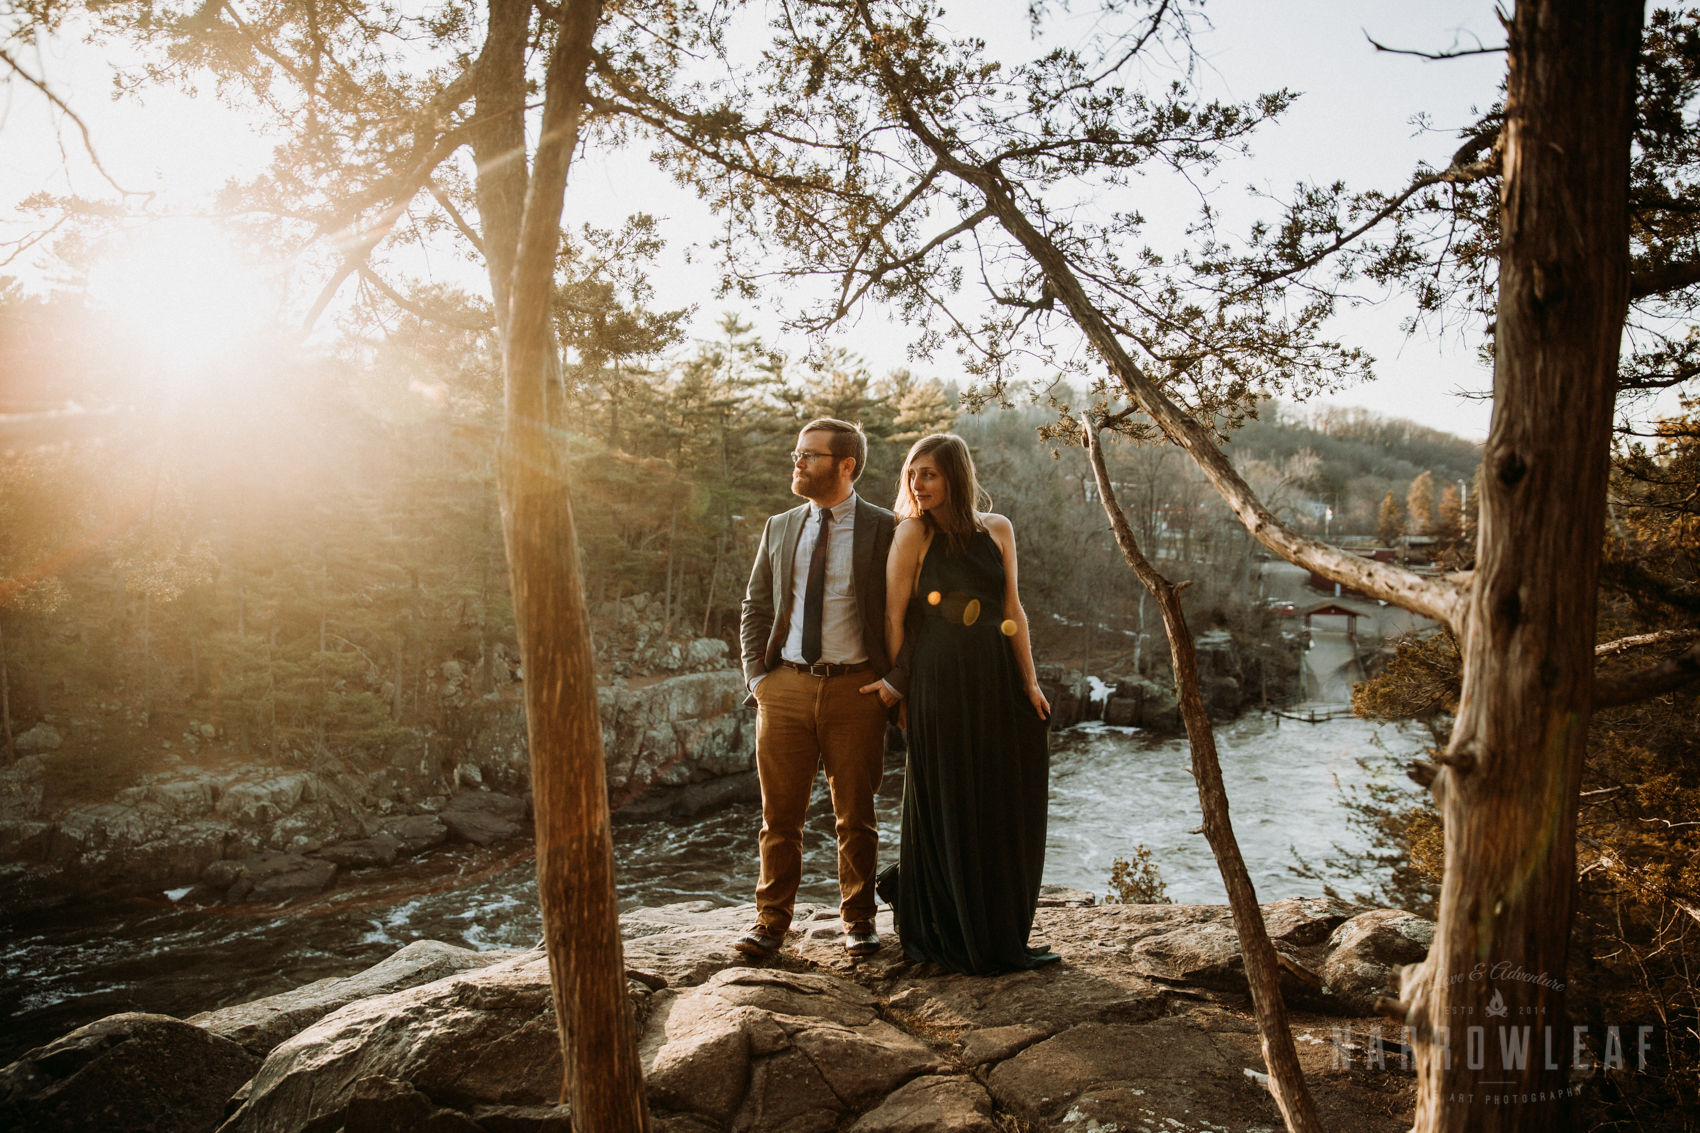 Spring-moody-wisconsin-woodsy-elopement-NarrowLeaf_Love_&_Adventure_Photography-0130.jpg